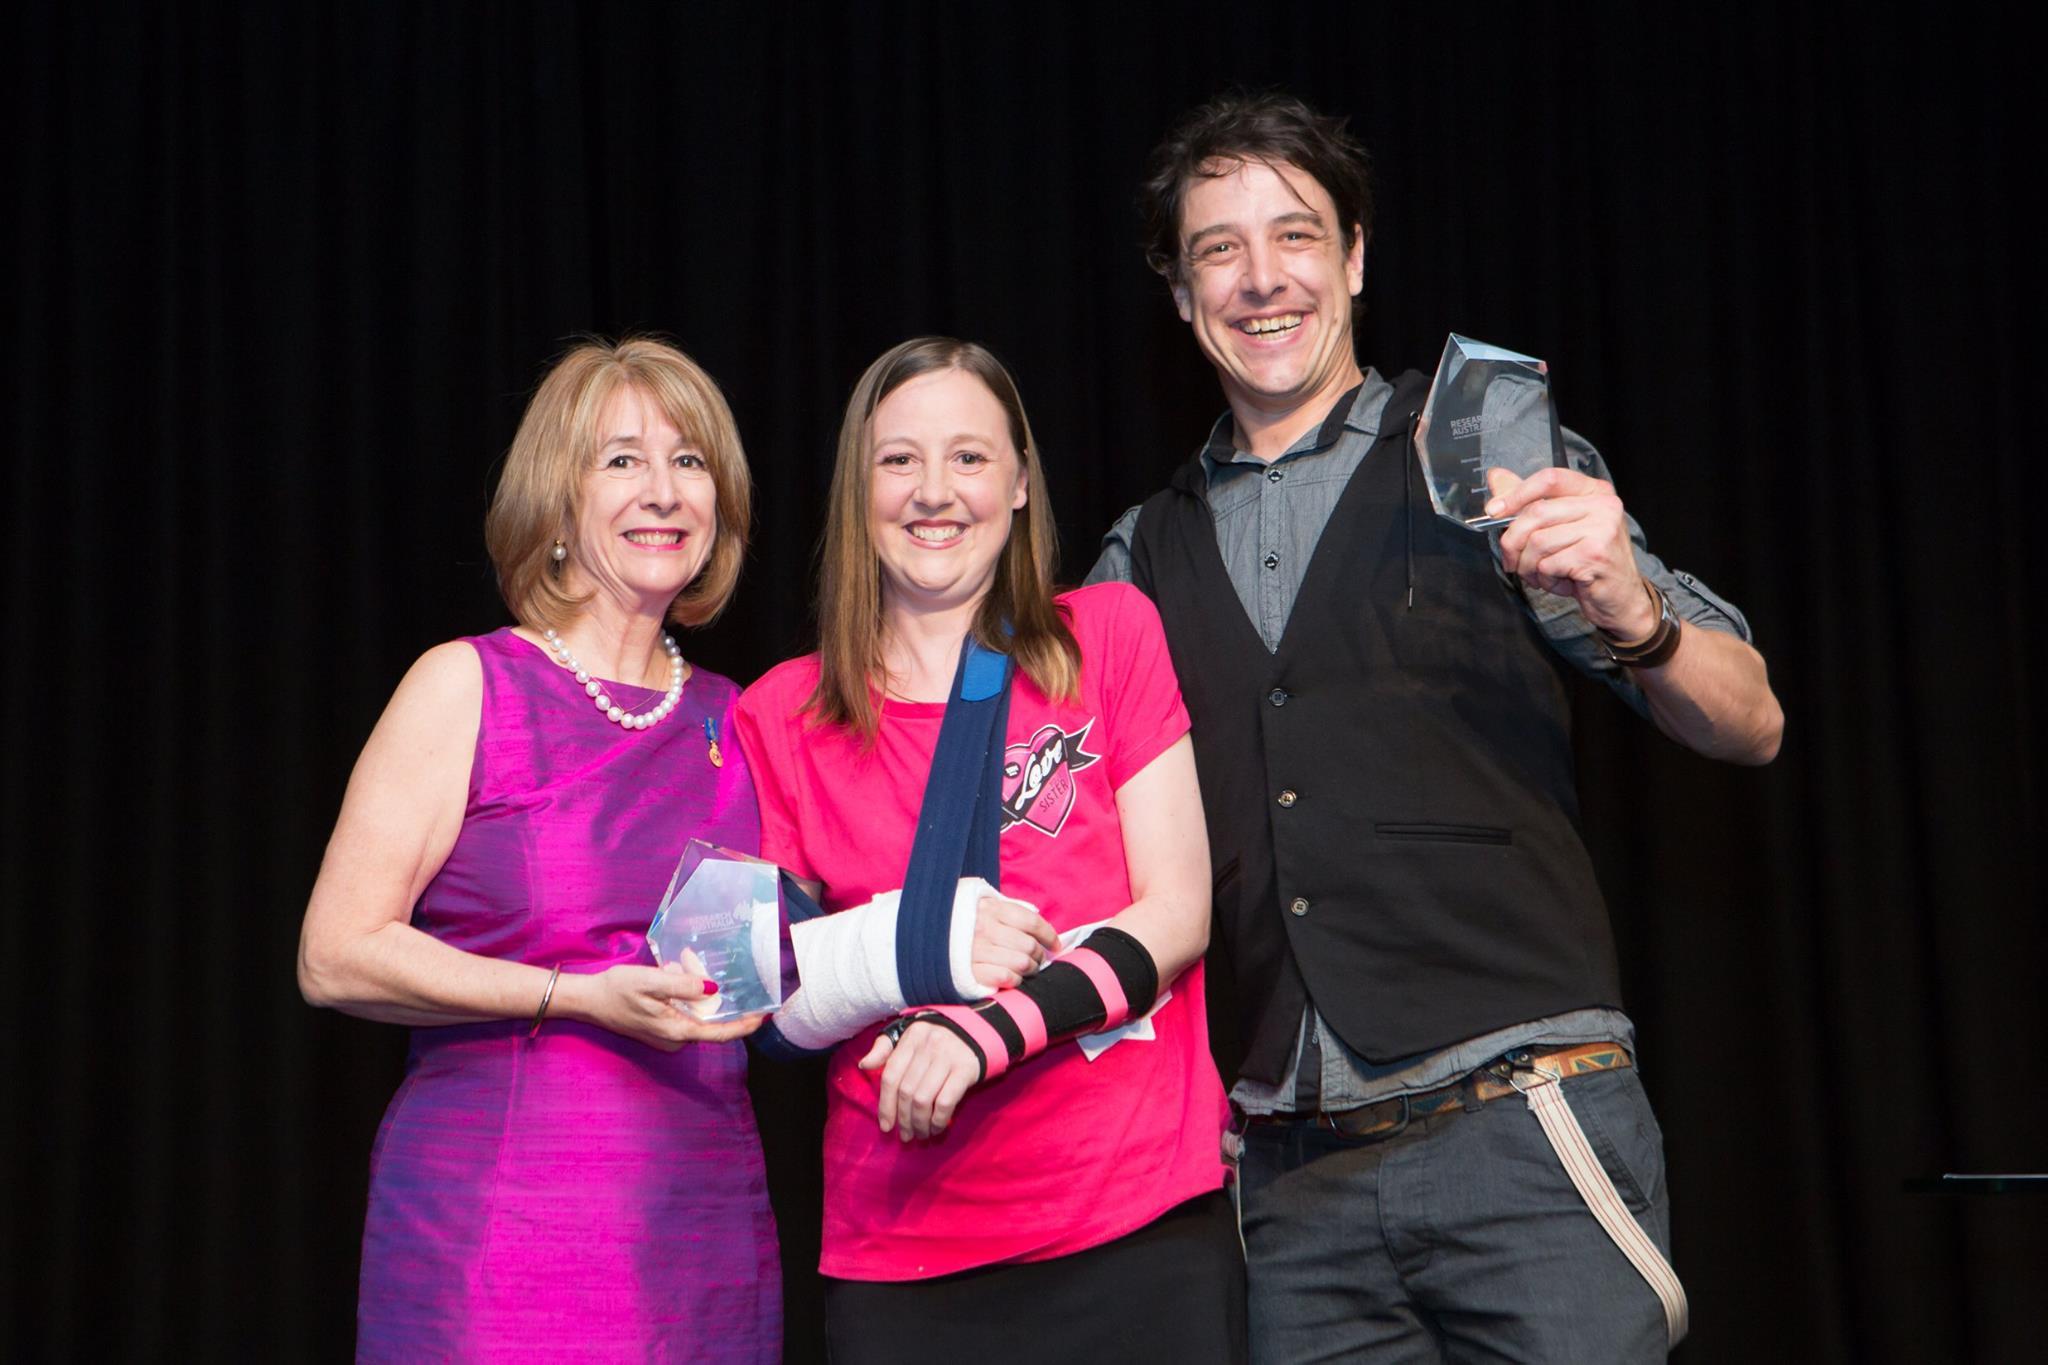 2015 Advocacy Award Winners: Connie and Sam Johnson